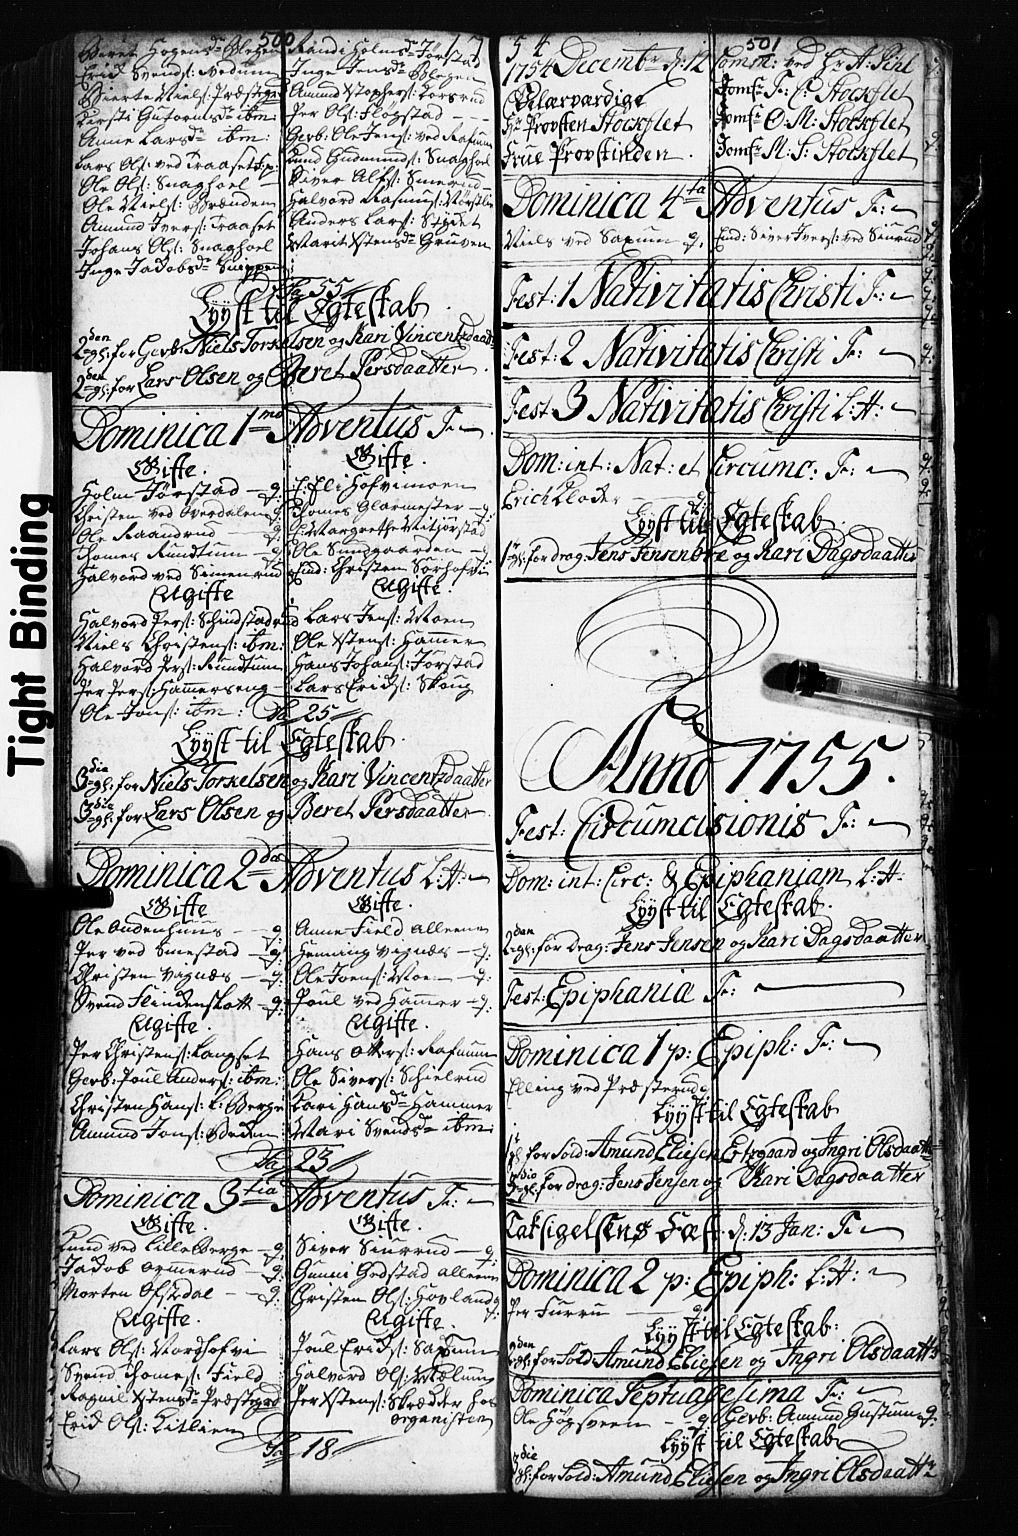 SAH, Fåberg prestekontor, Klokkerbok nr. 2, 1741-1756, s. 500-501